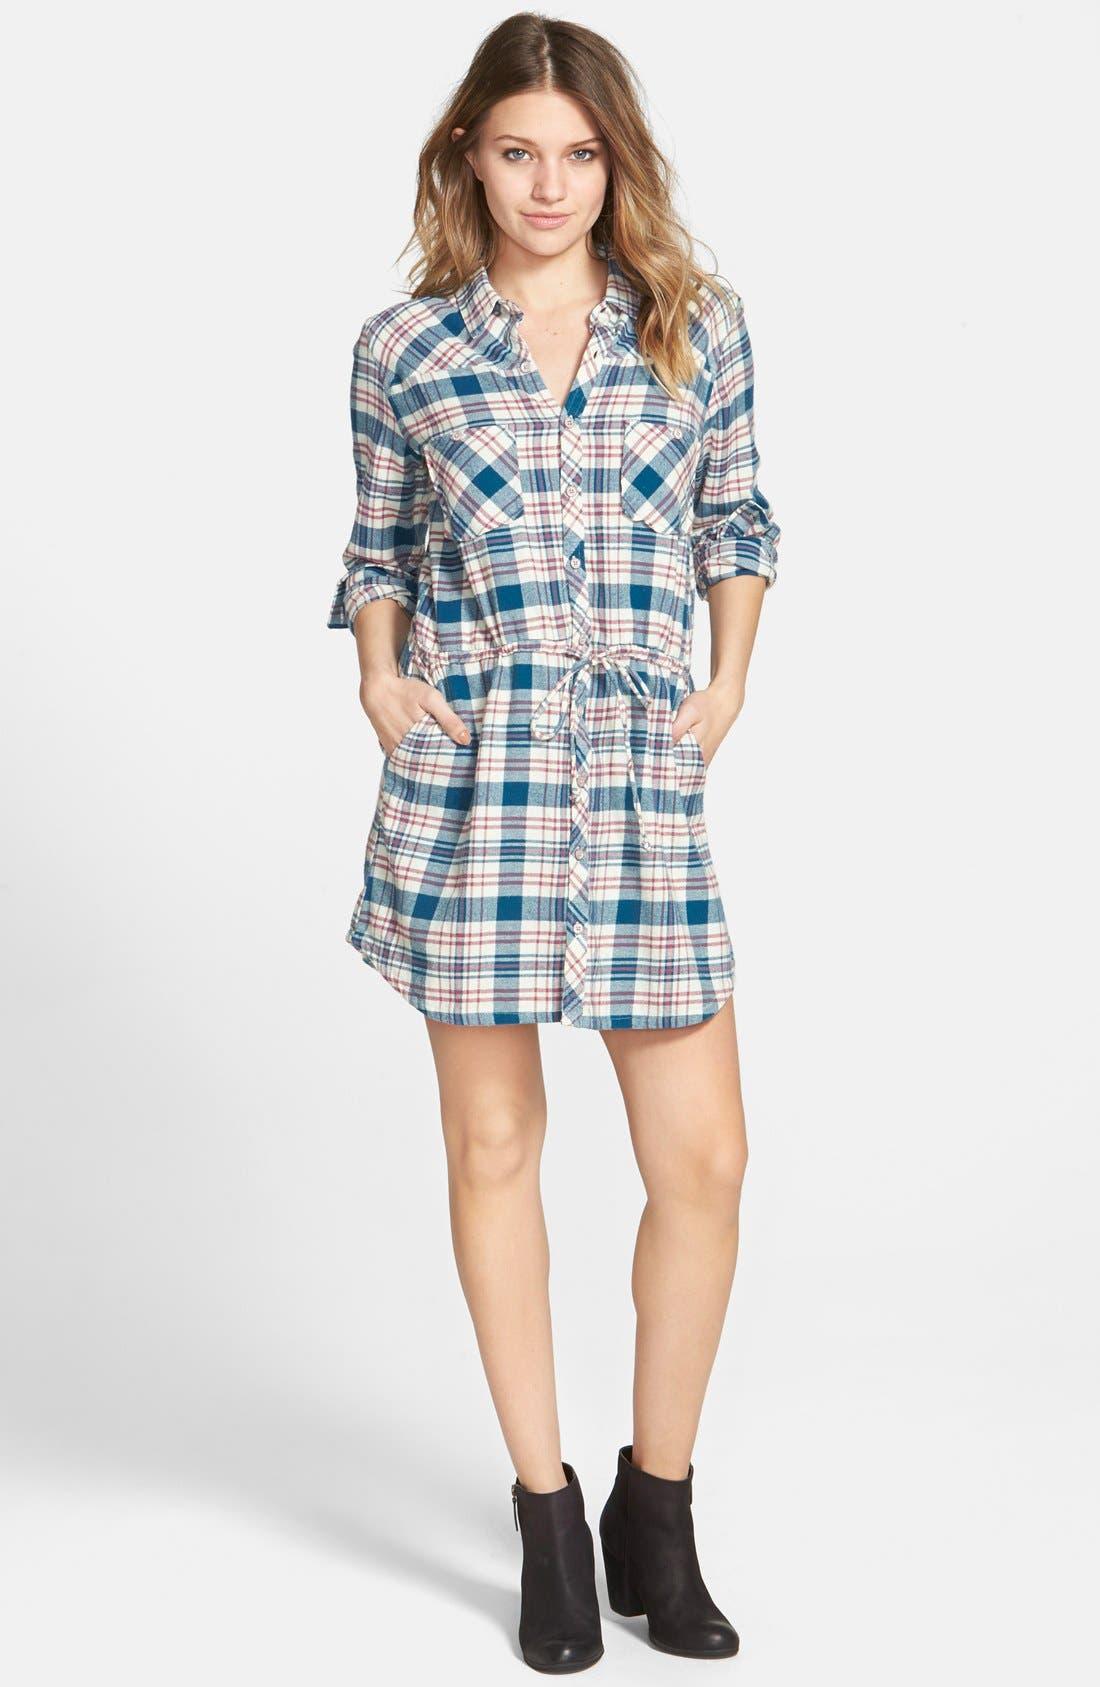 Alternate Image 1 Selected - Element 'Recess' Plaid Shirtdress